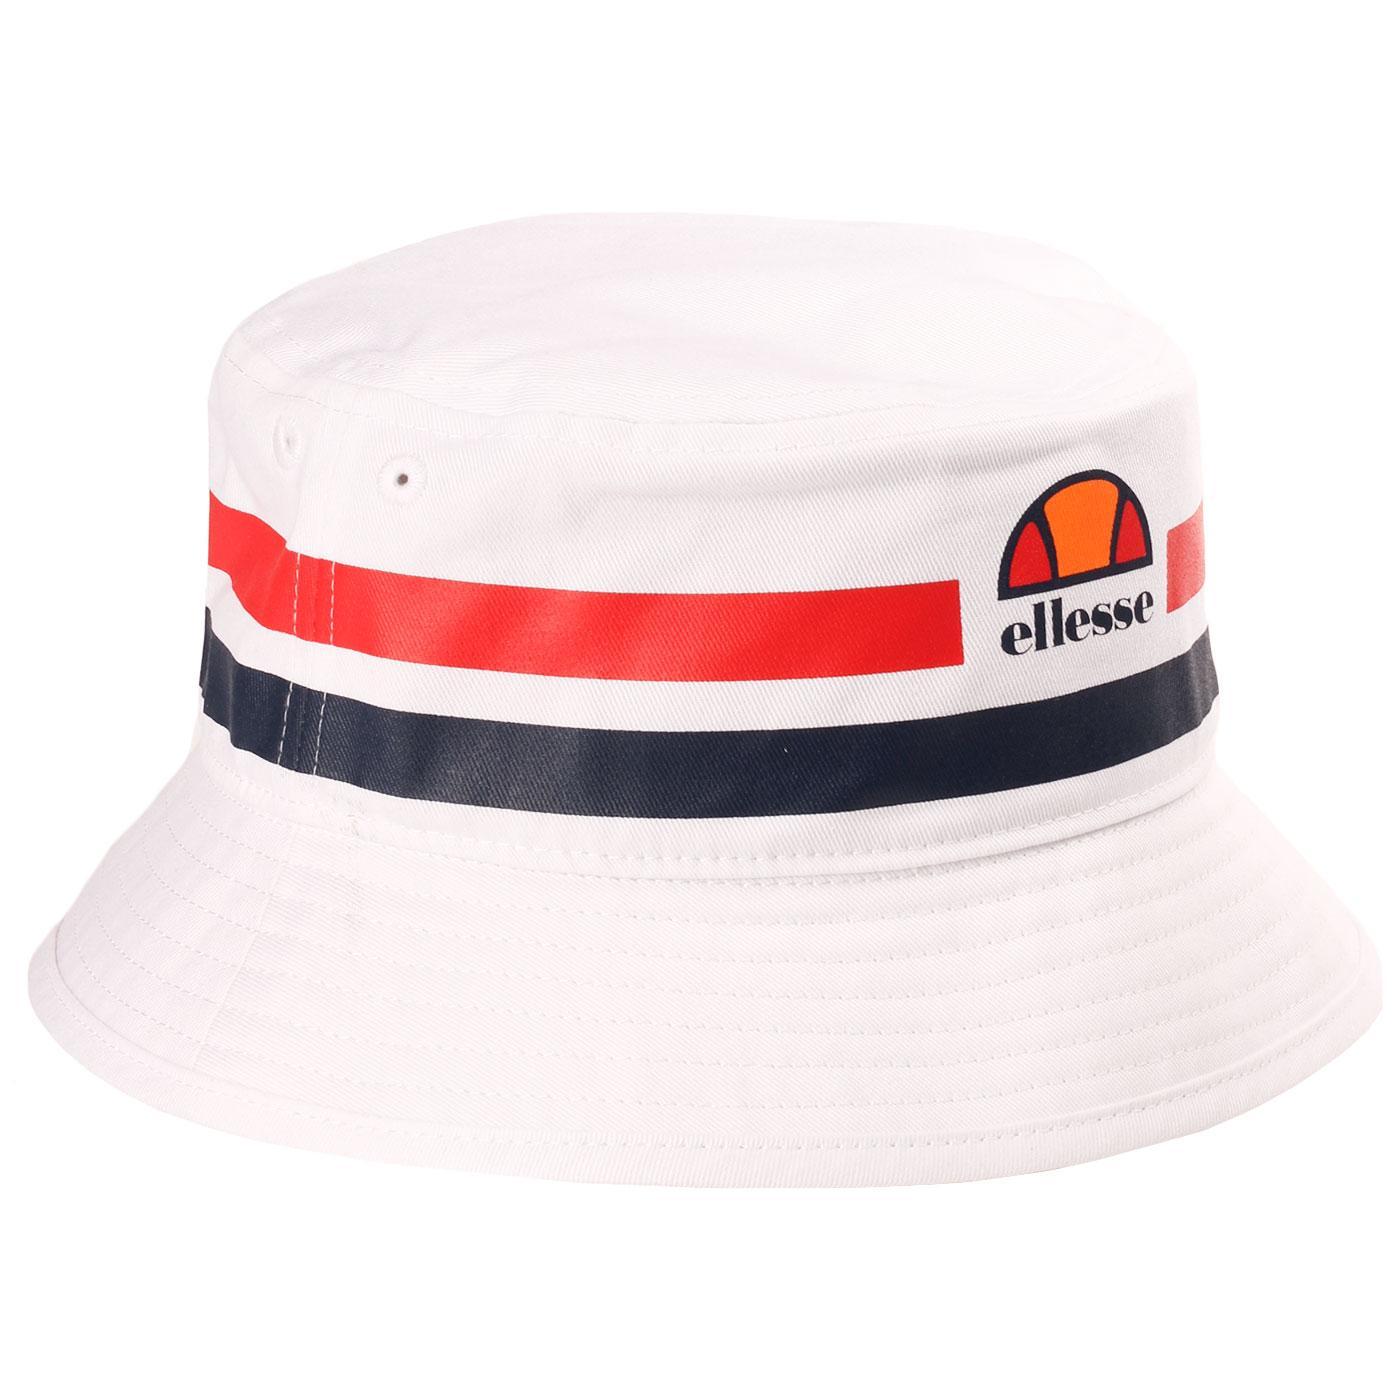 Lanori ELLESSE Retro 90s Bucket Hat (England)